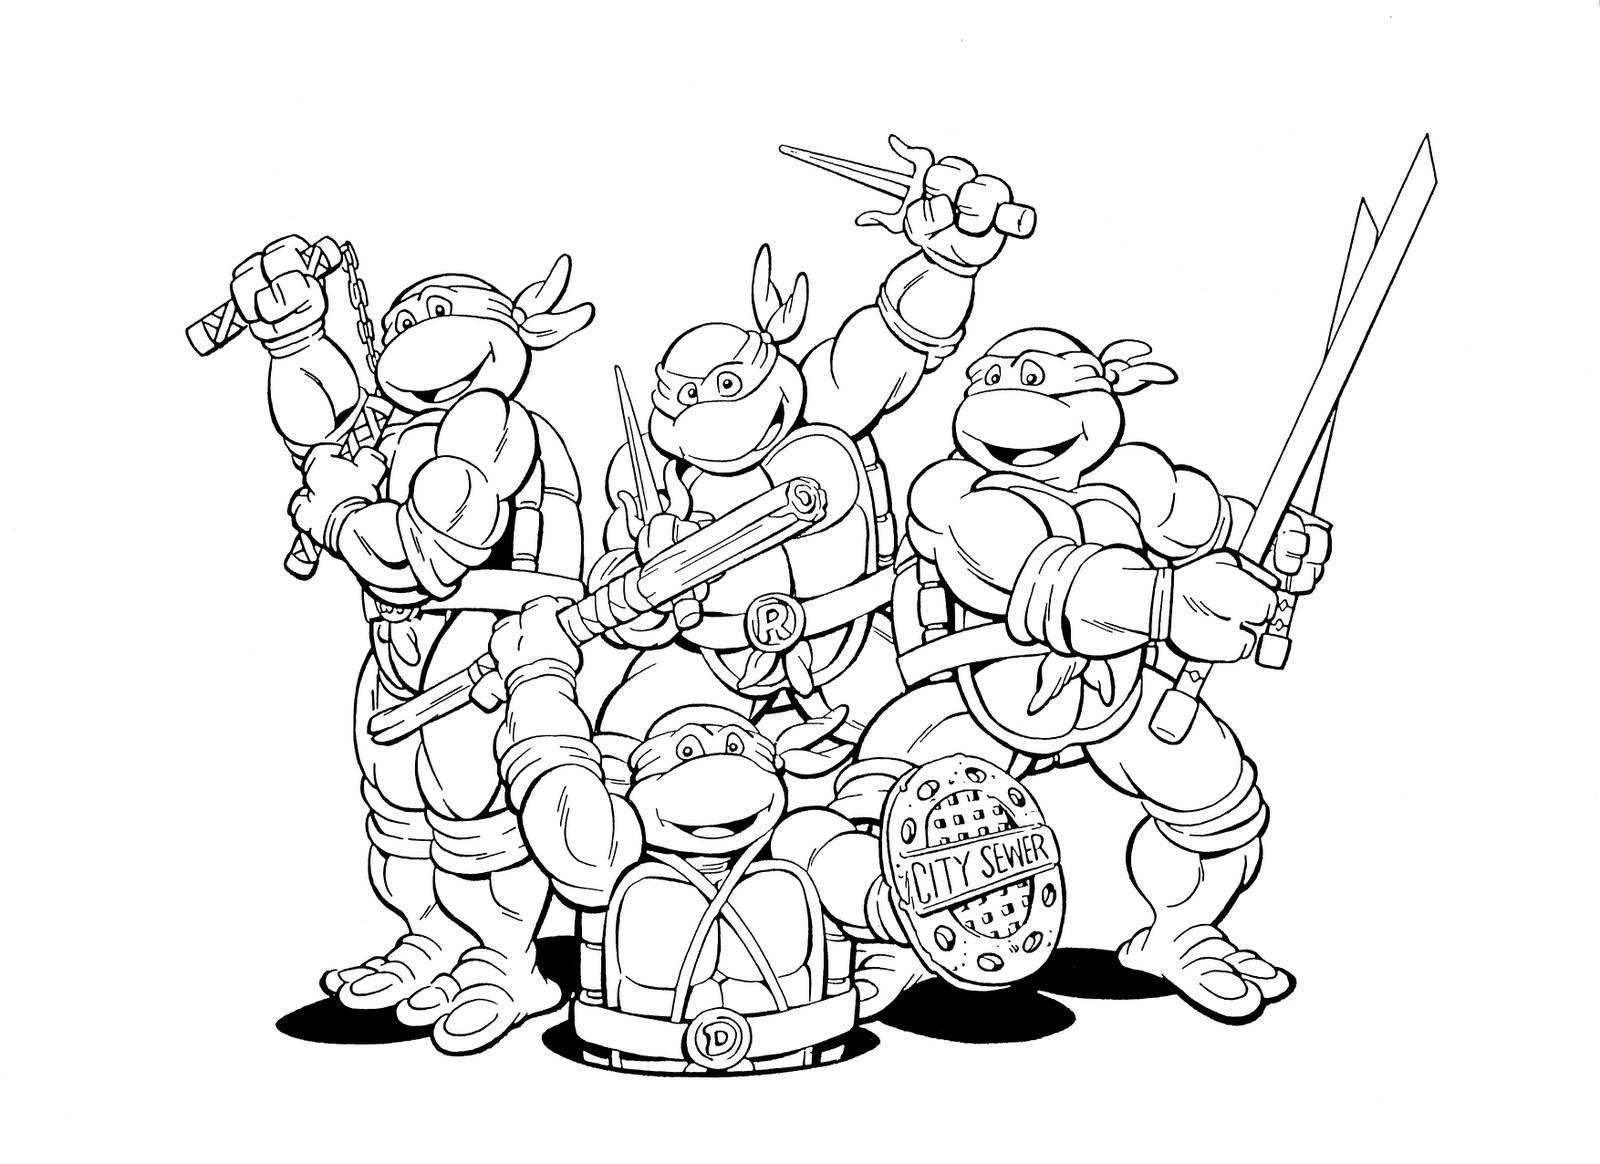 ninja turtles coloring pictures ninja turtle coloring pages free printable pictures pictures turtles coloring ninja